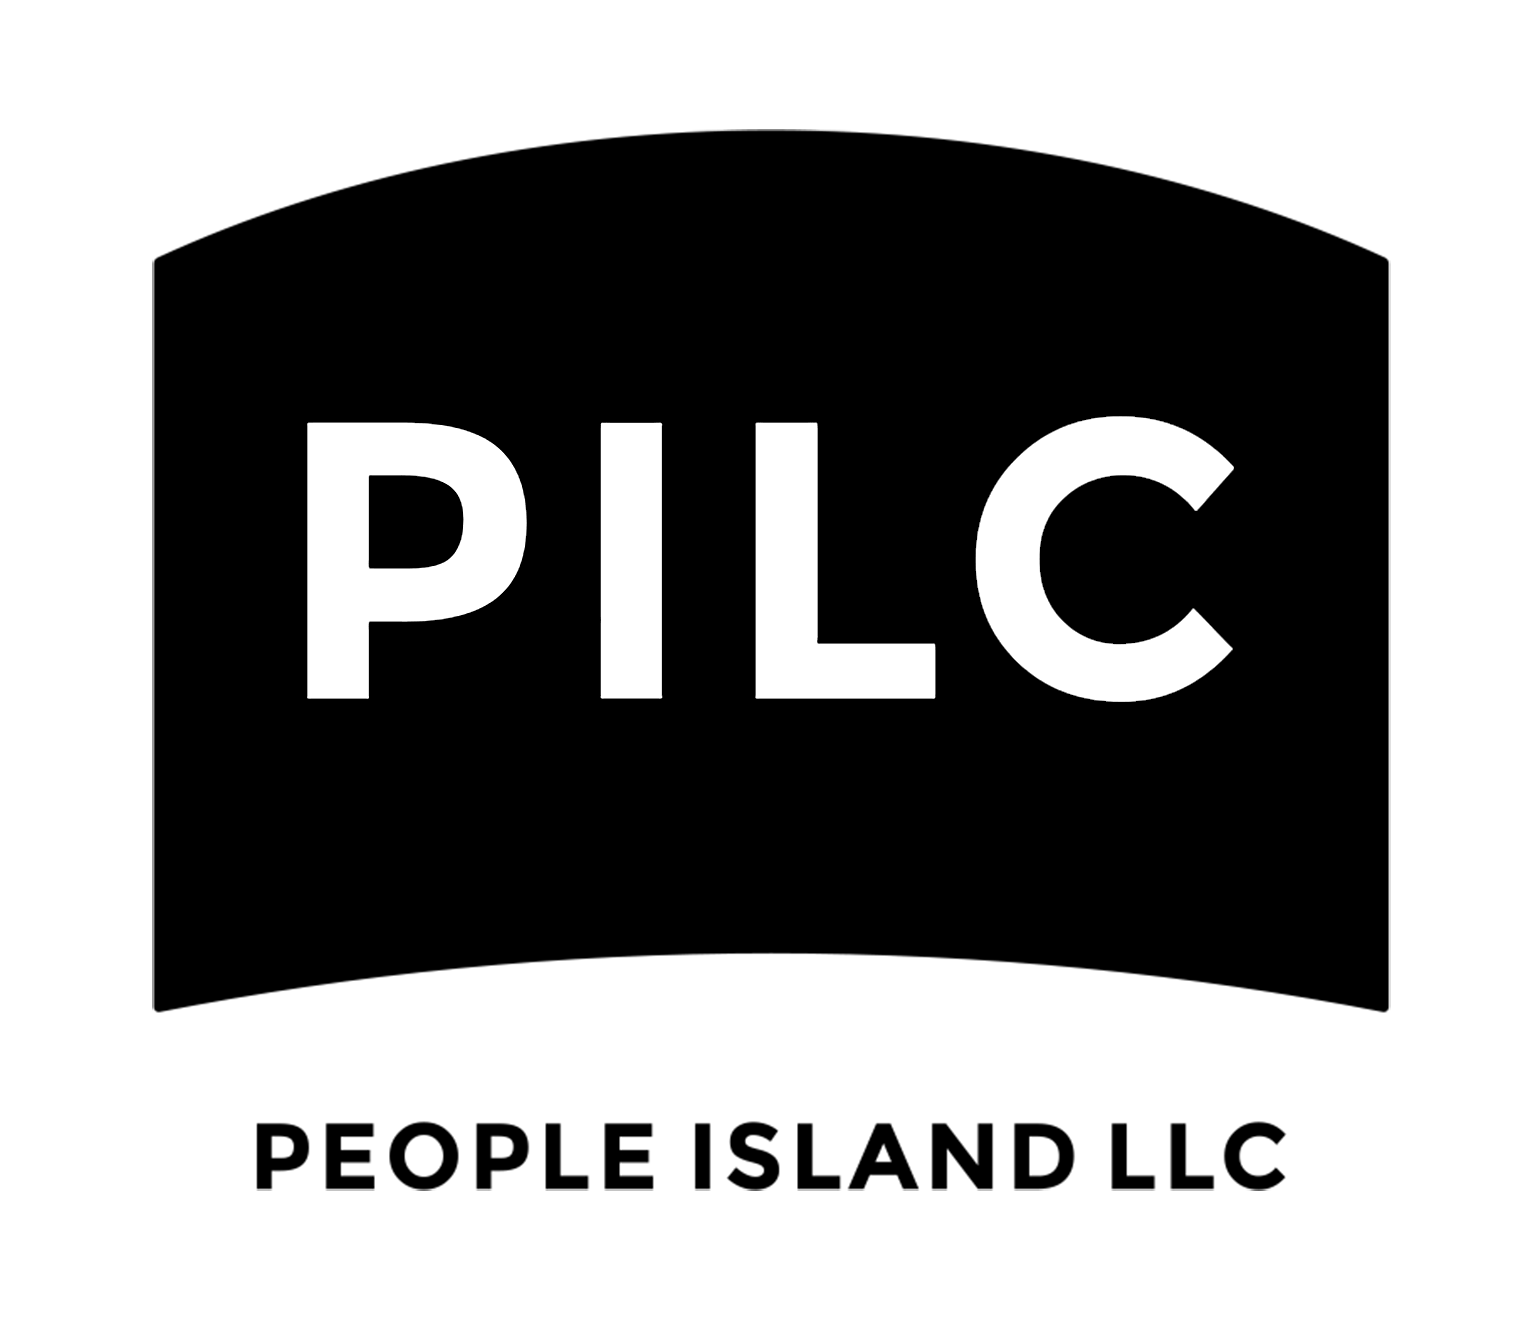 PEOPLE ISLAND.LLC